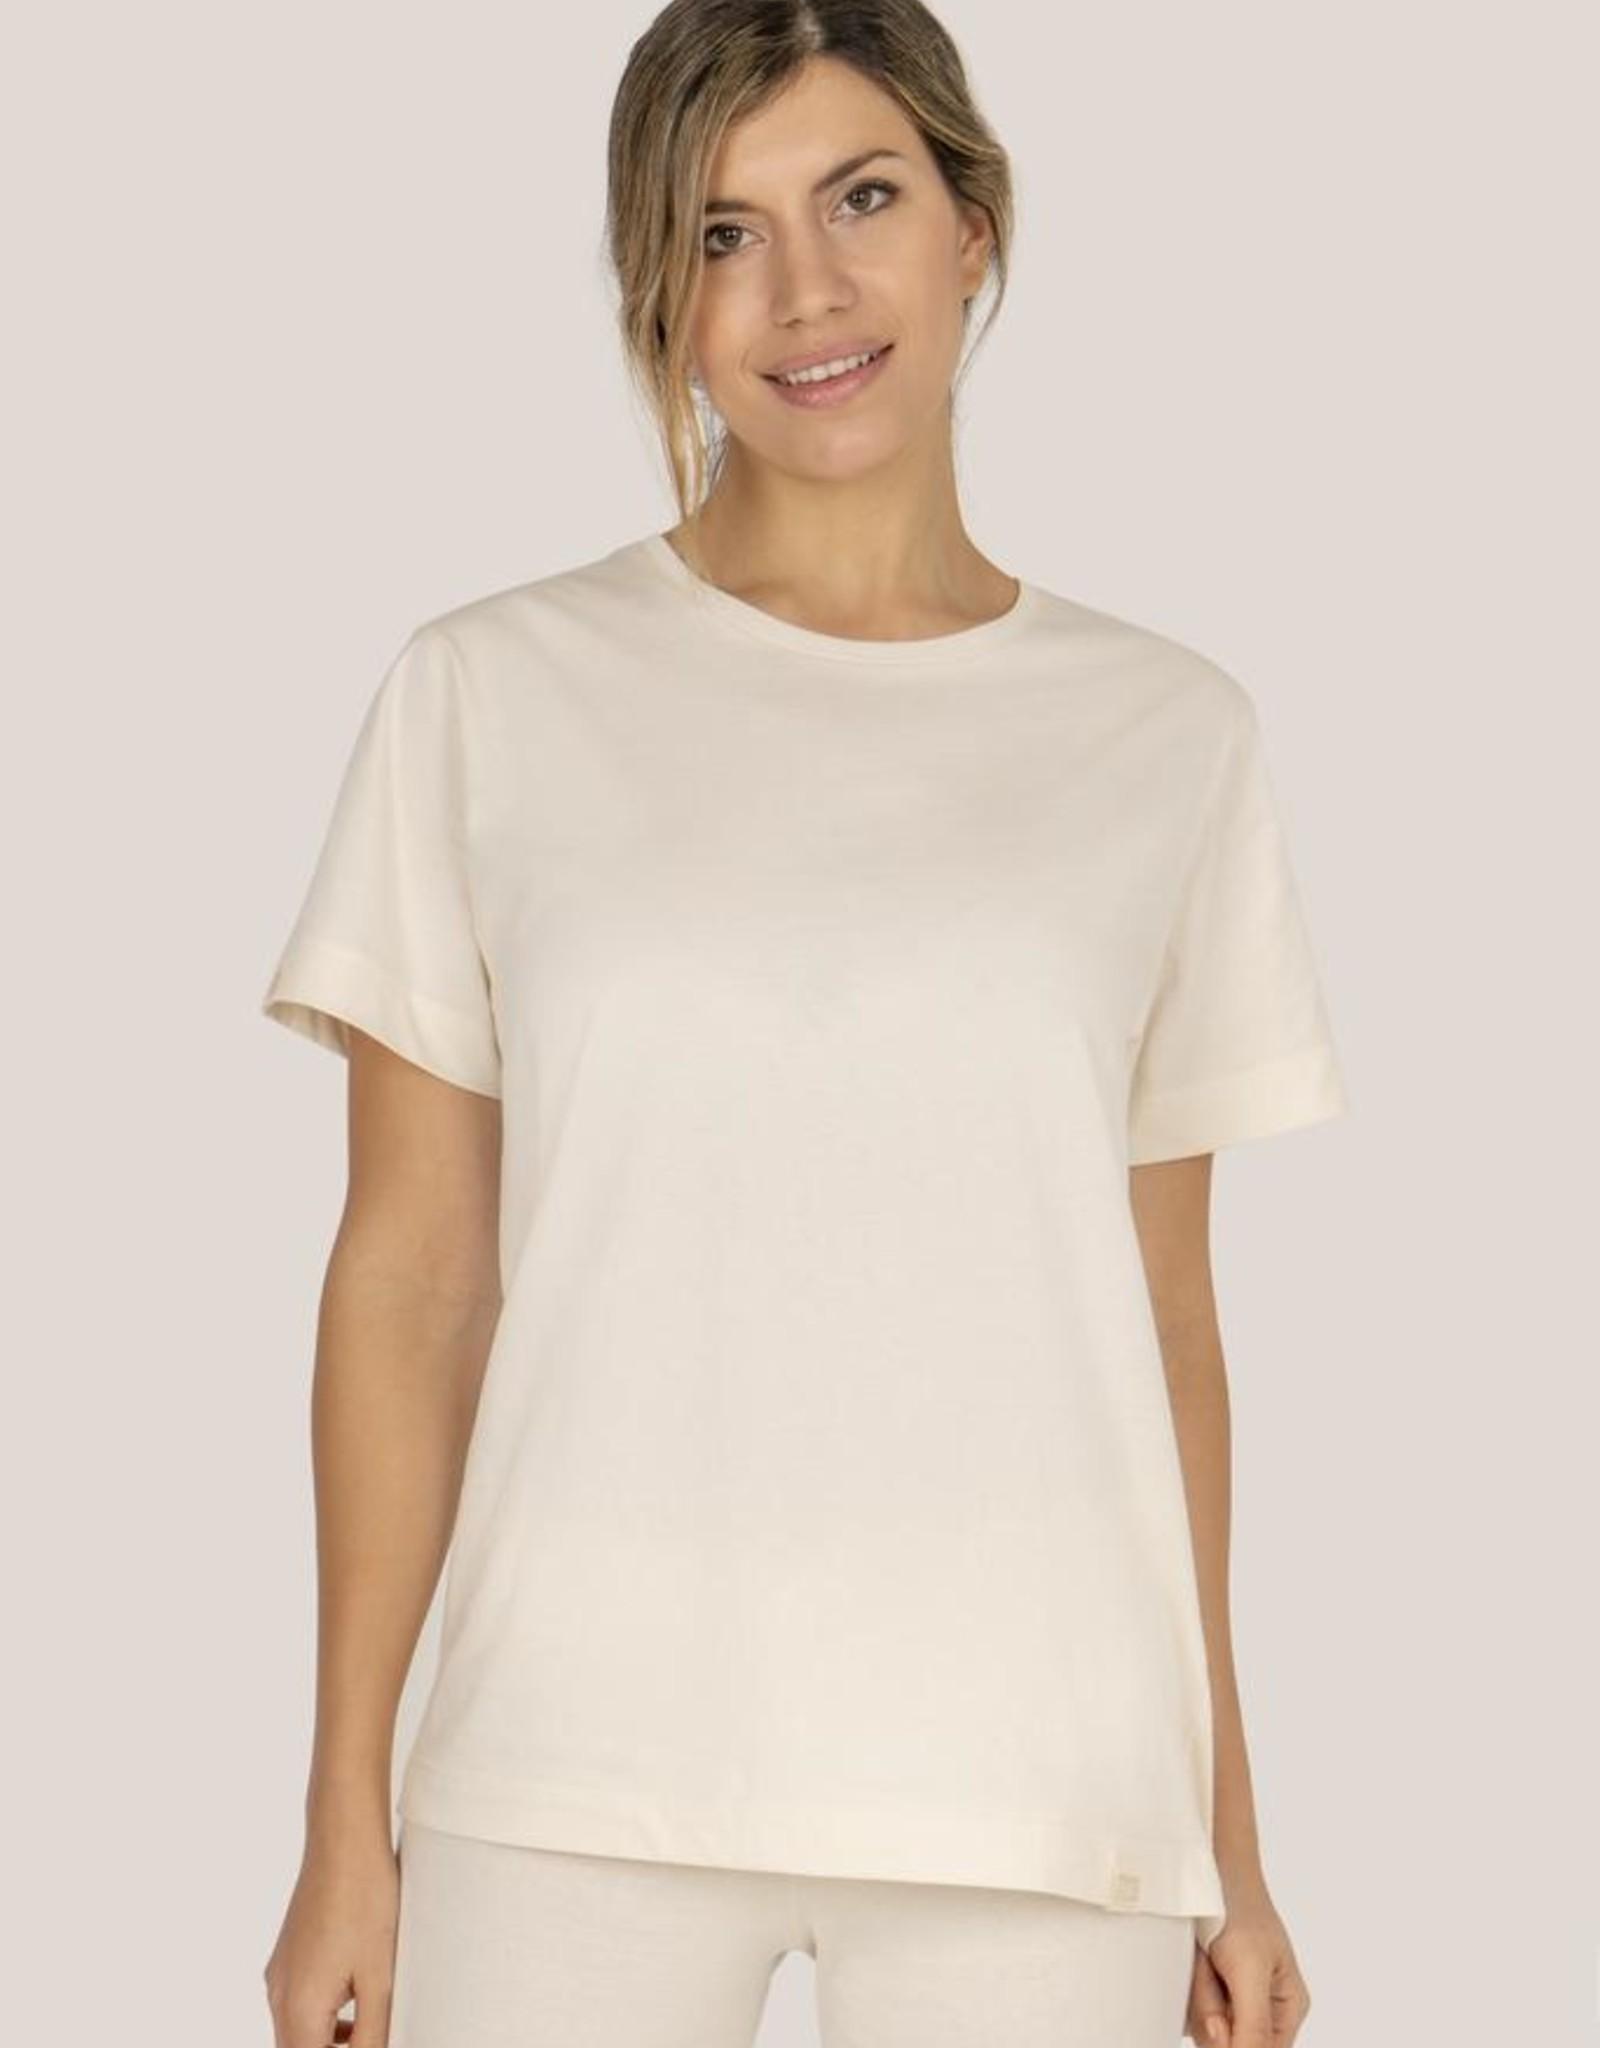 Unisex short-sleeved shirt